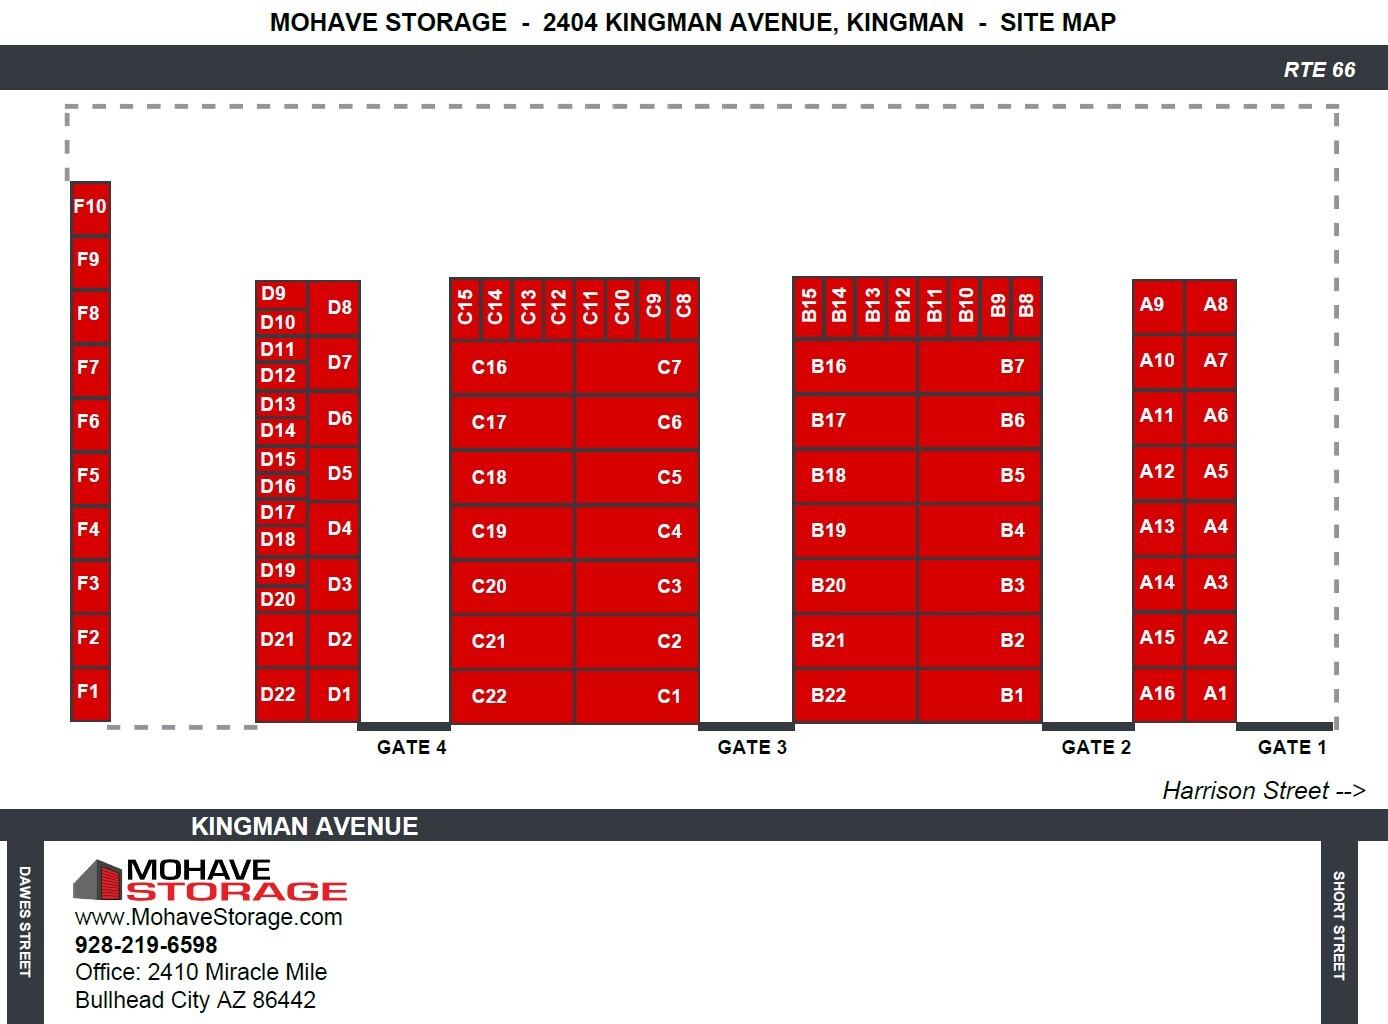 Site Map 2404 Kingman Avenue Kingman Site Map Prospective Tenants Mohave Storage